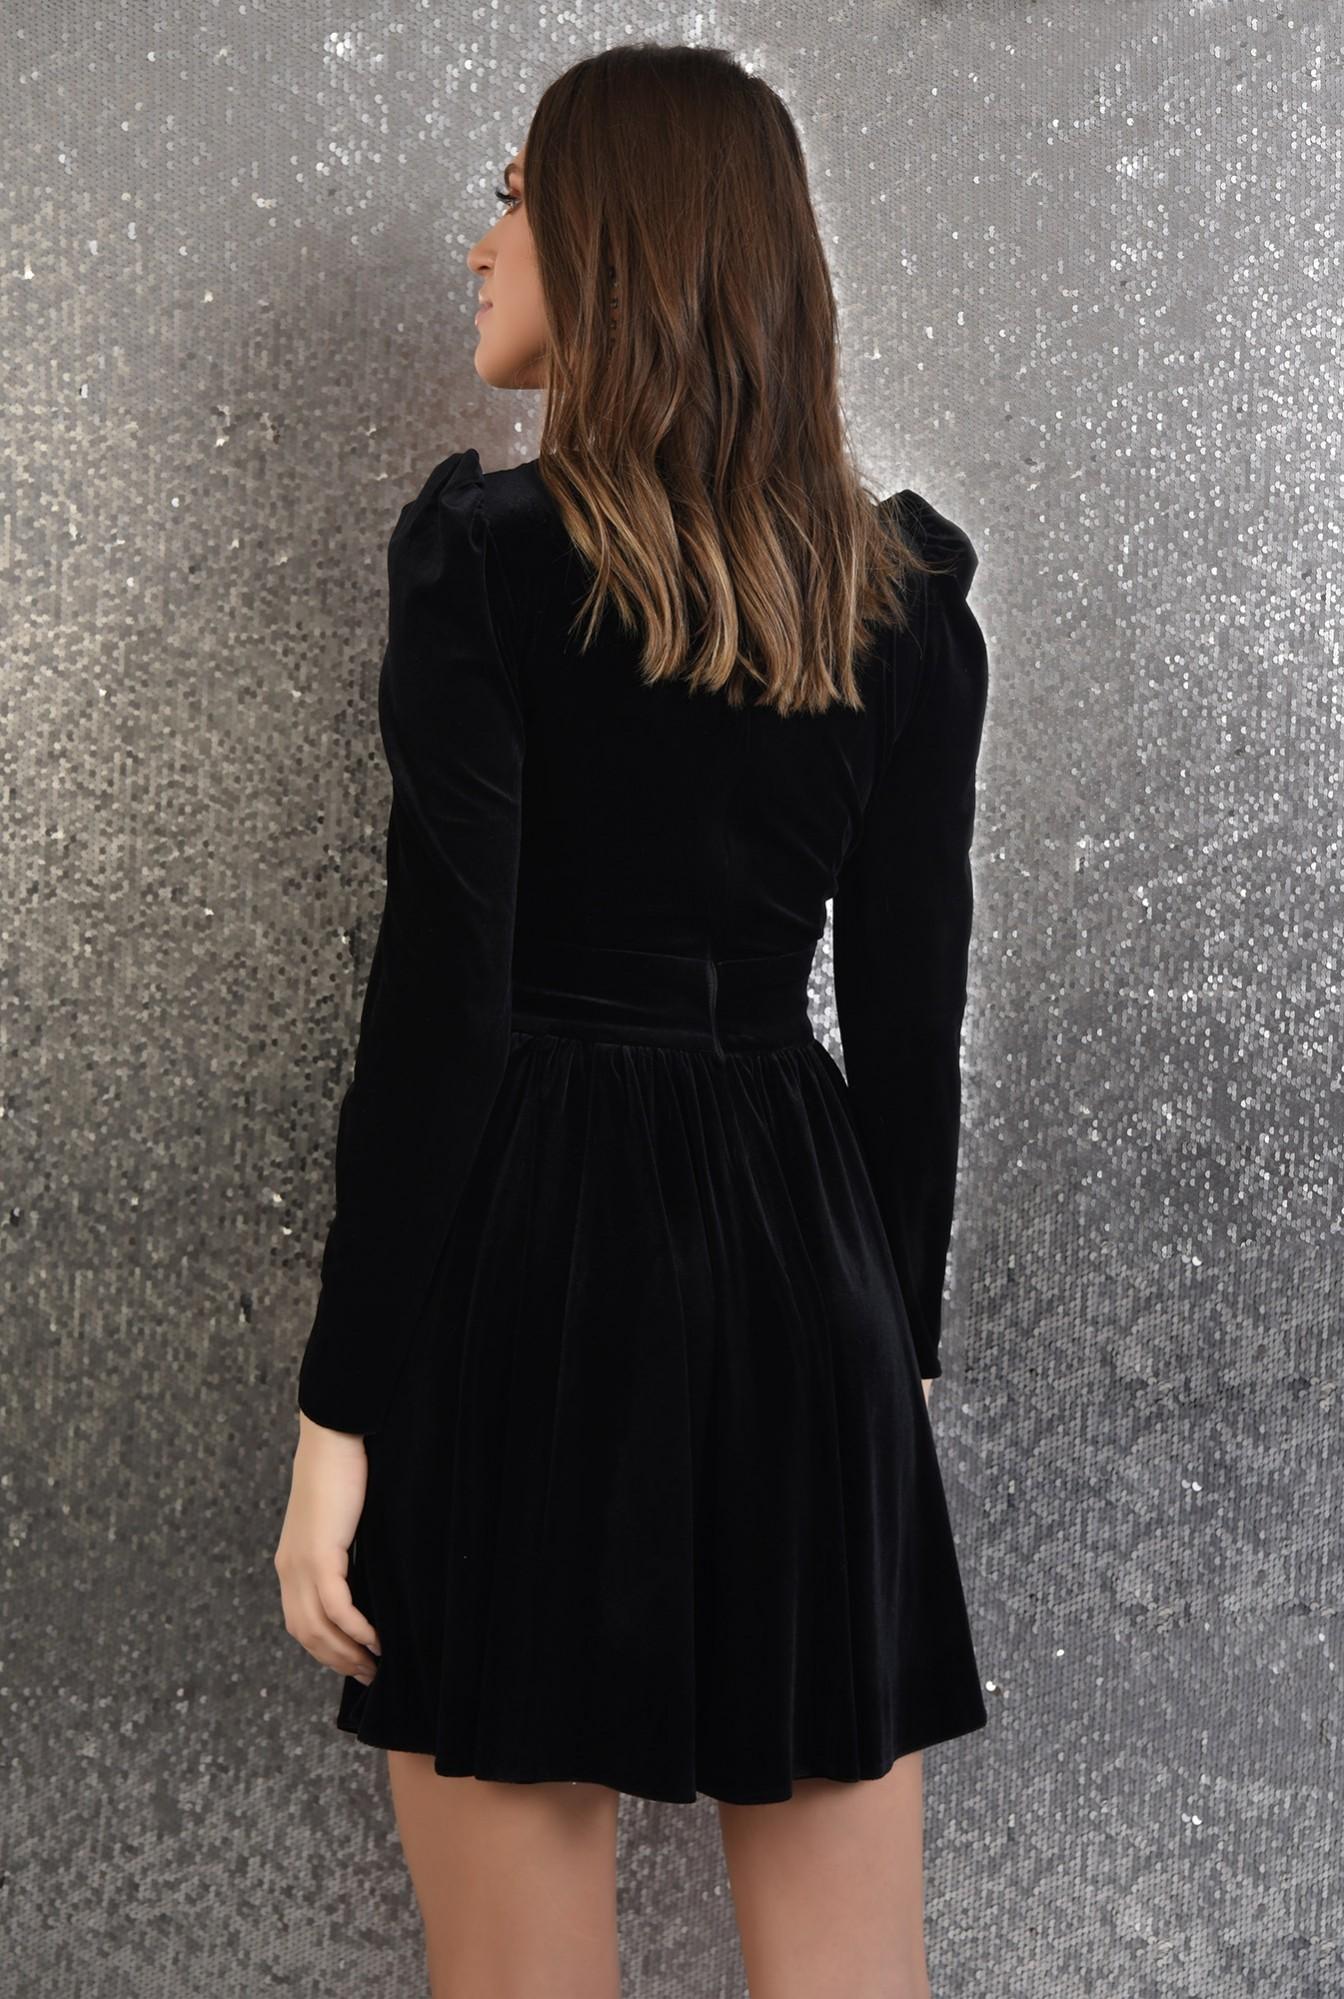 1 - rochie neagra, din catifea, clos, maneci lungi, decolteu in V